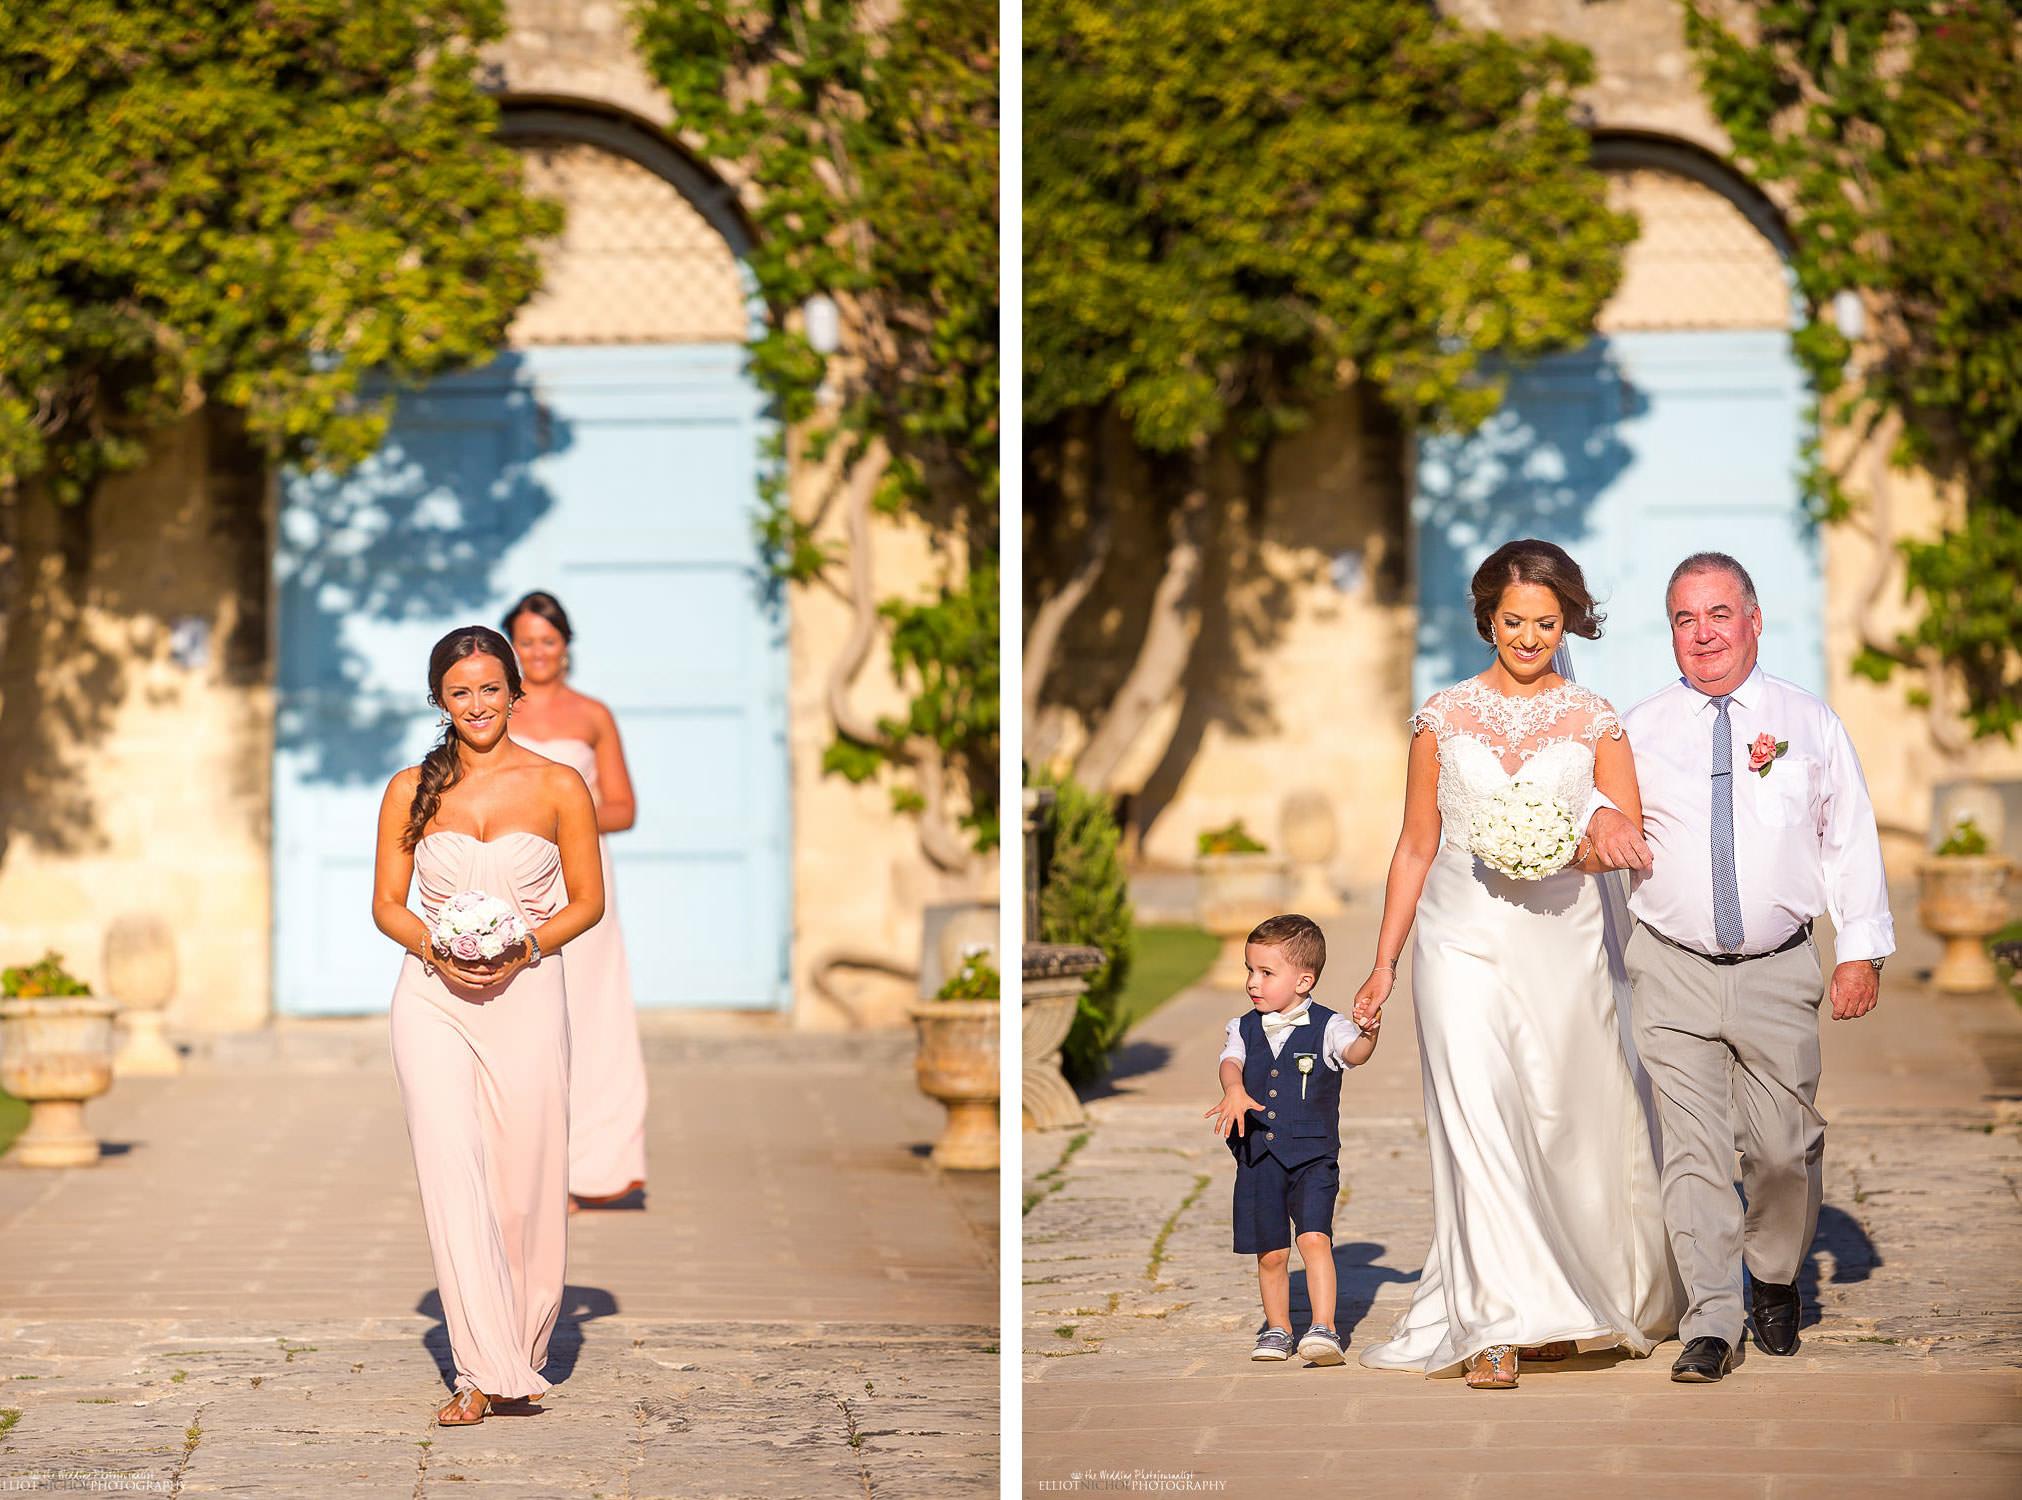 Bridal party make their procession to the wedding ceremony in the Baroque gardens at Villa Bologna., Malta.